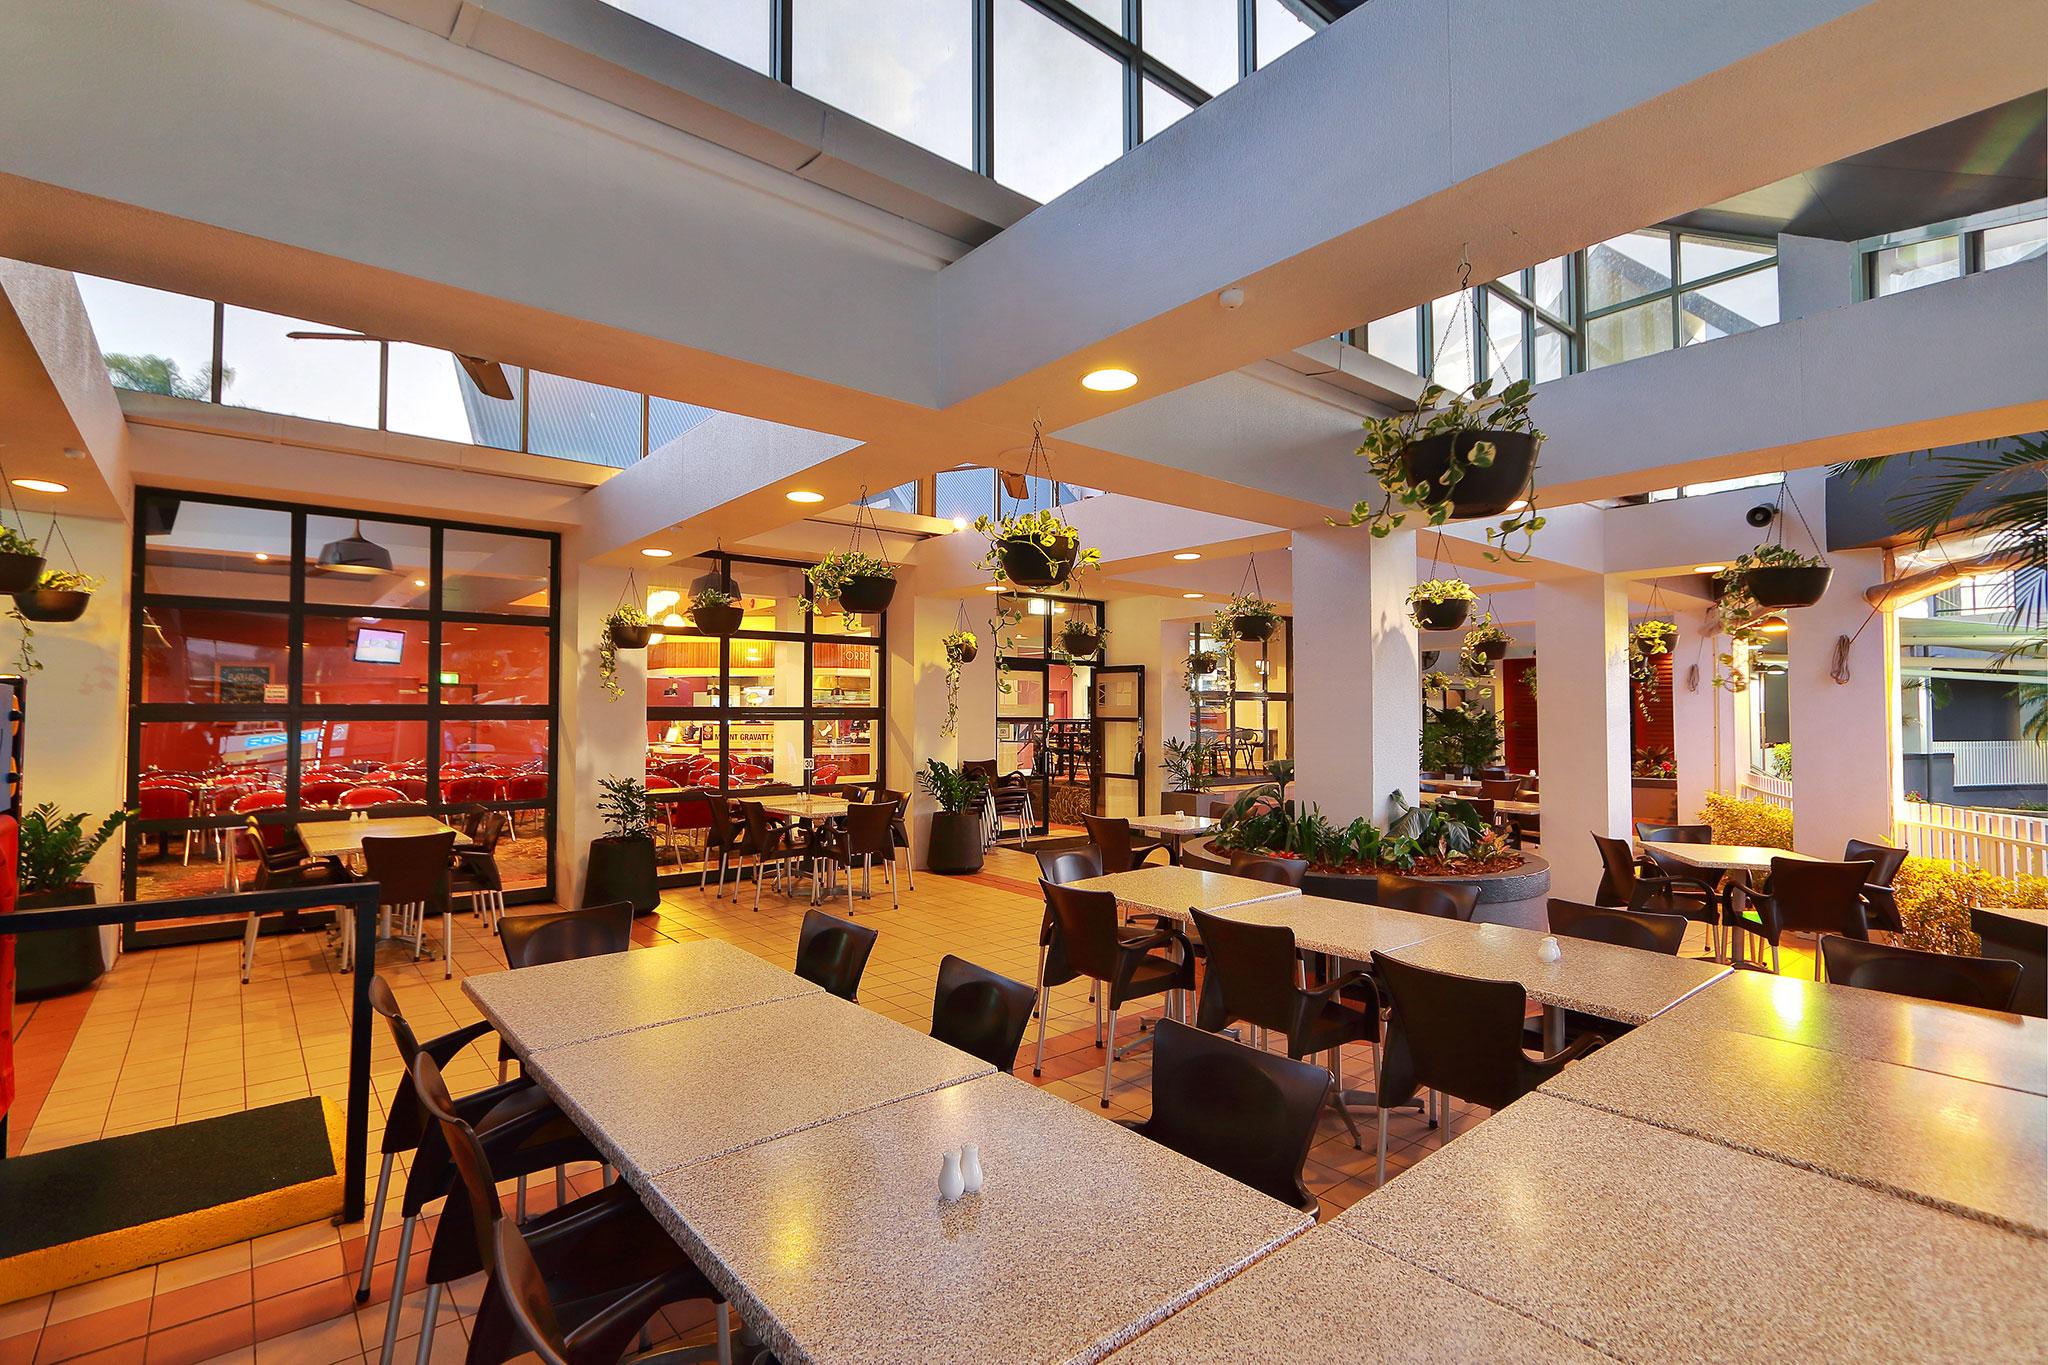 Restaurant-Patio.jpg